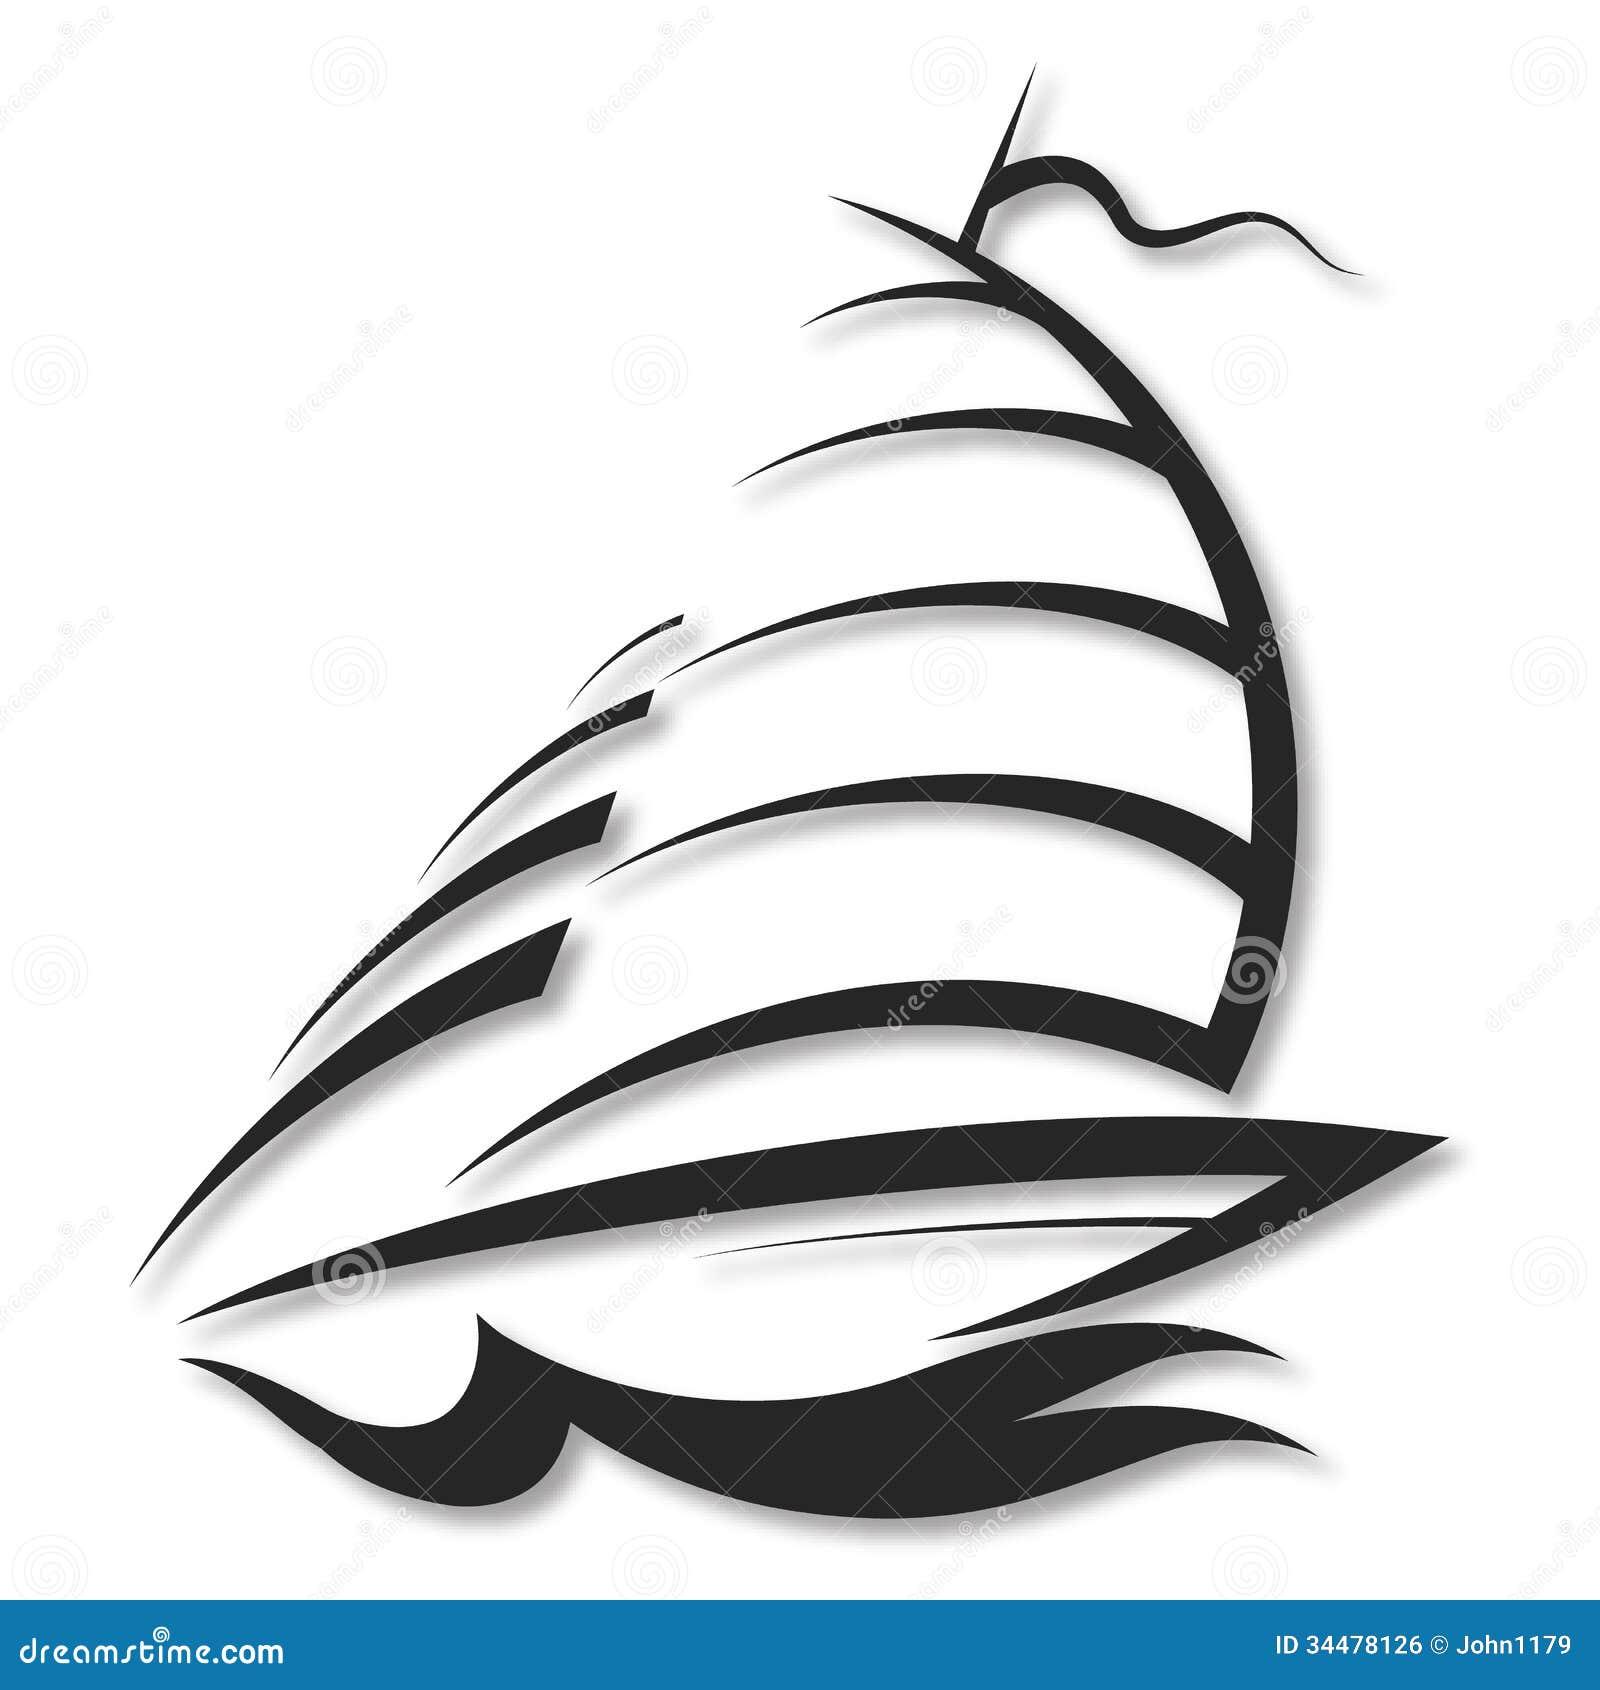 Yacht design free ebooks pdf